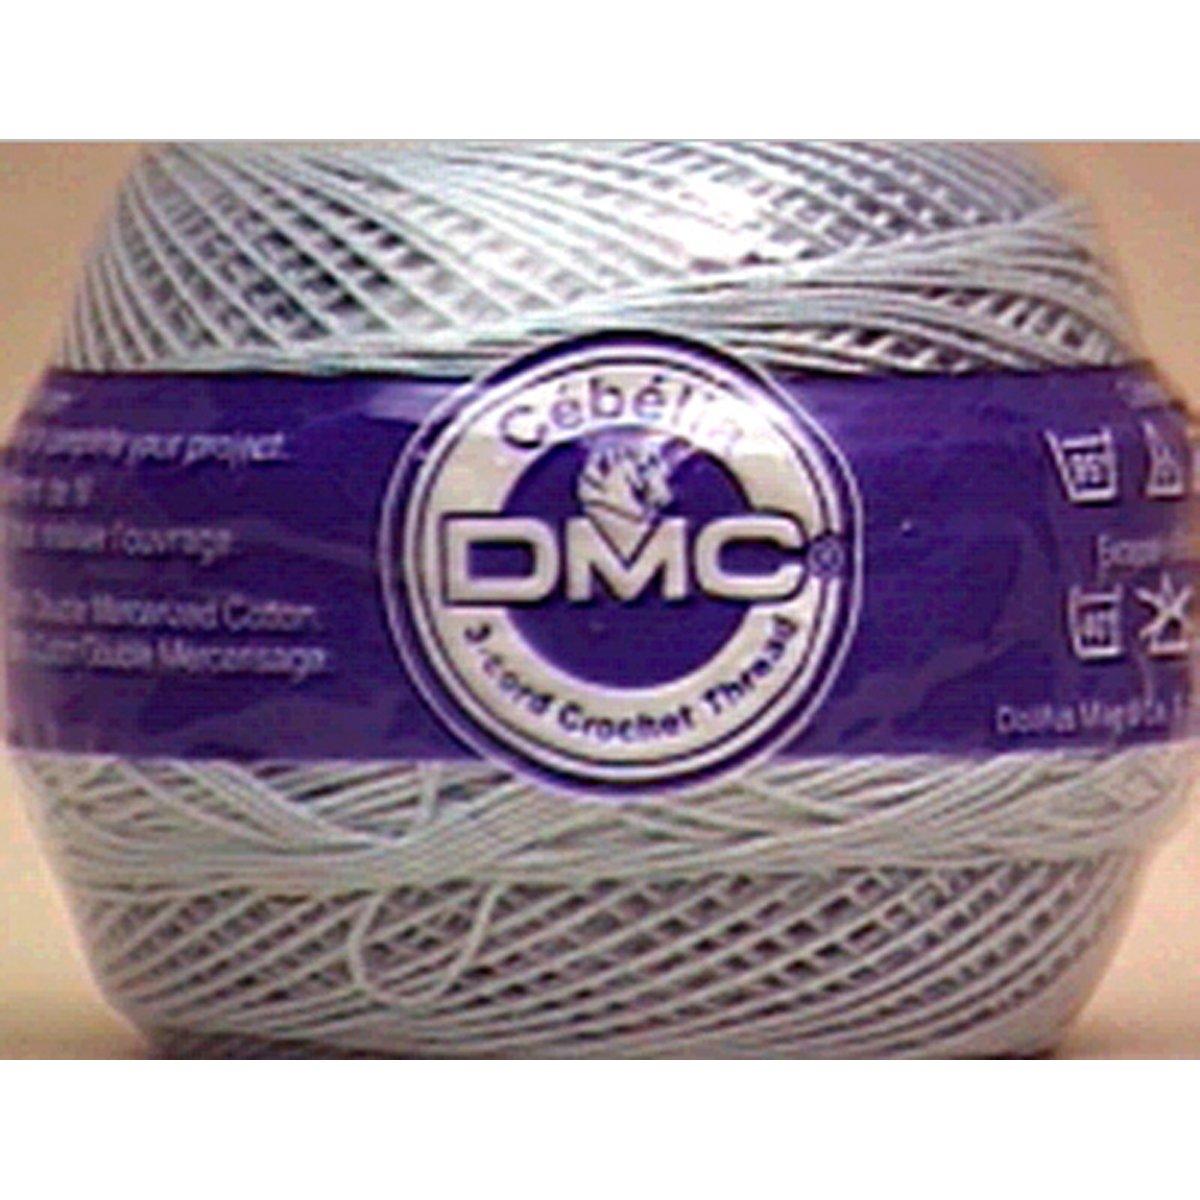 DMC 167GA 10-754 Cebelia Crochet Cotton, 282-Yard, Size 10, Beige Rose Notions - In Network